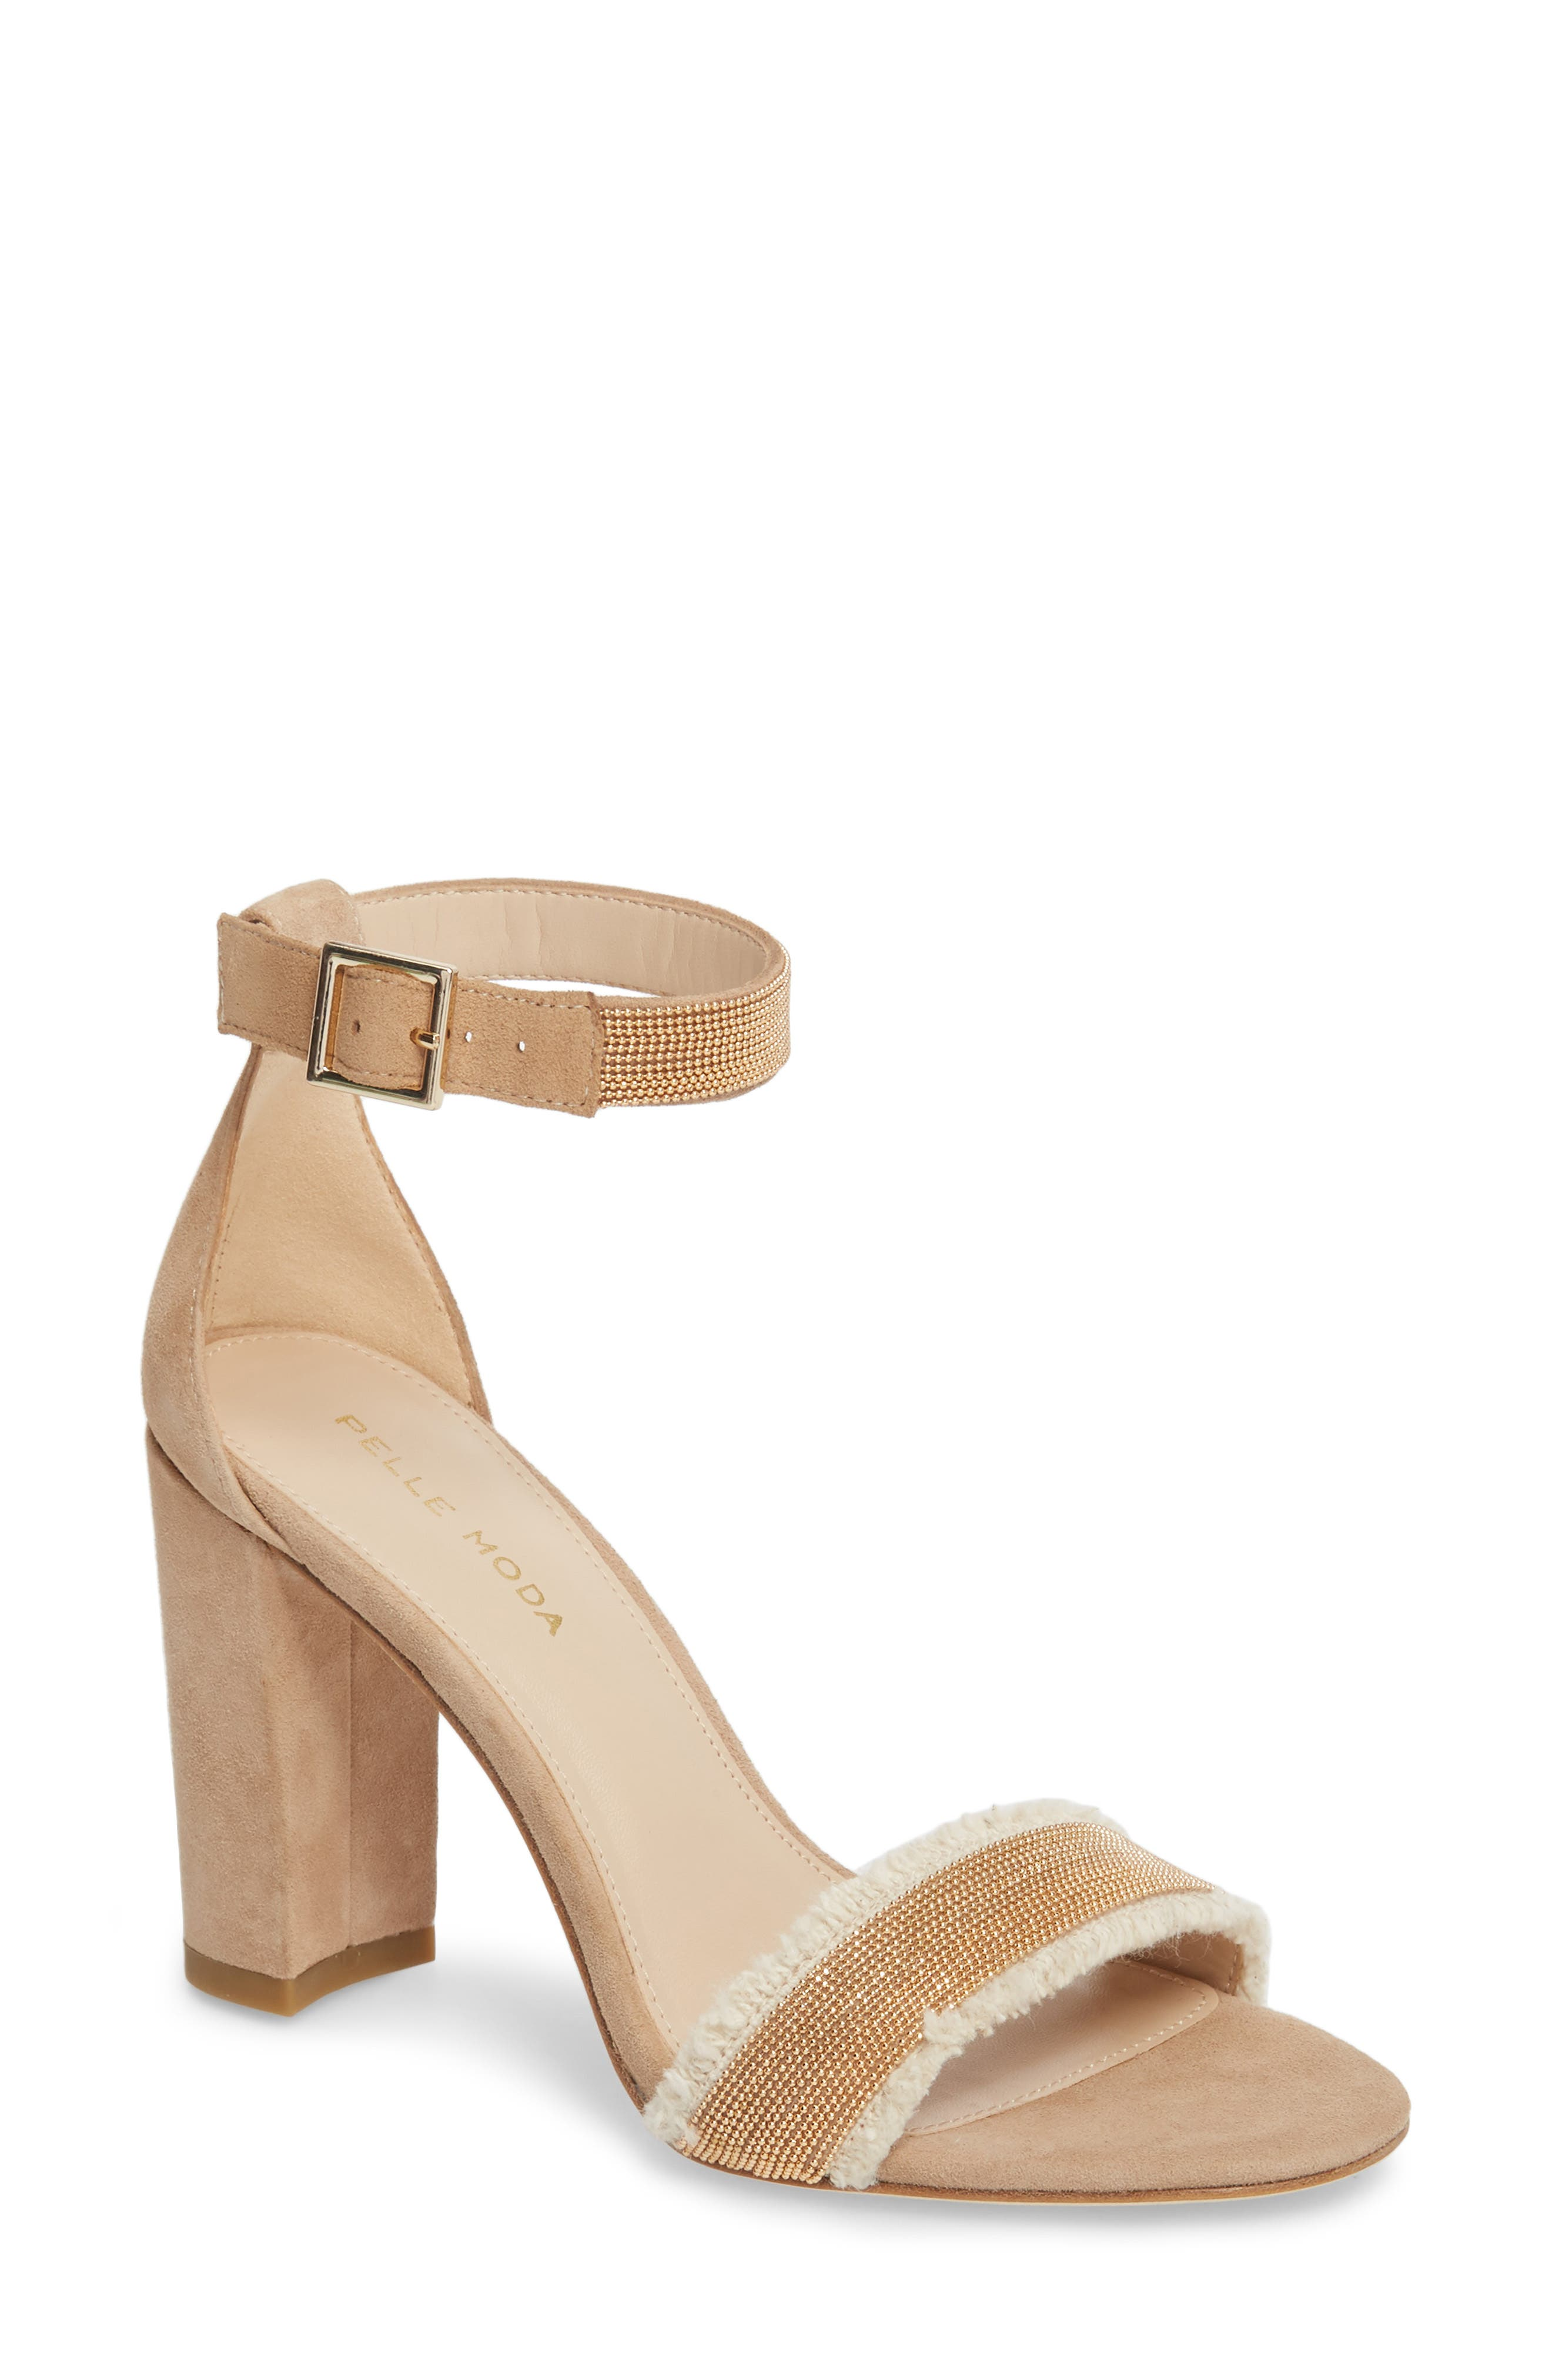 Pelle Moda Bonnie6 Embellished Sandal (Women)